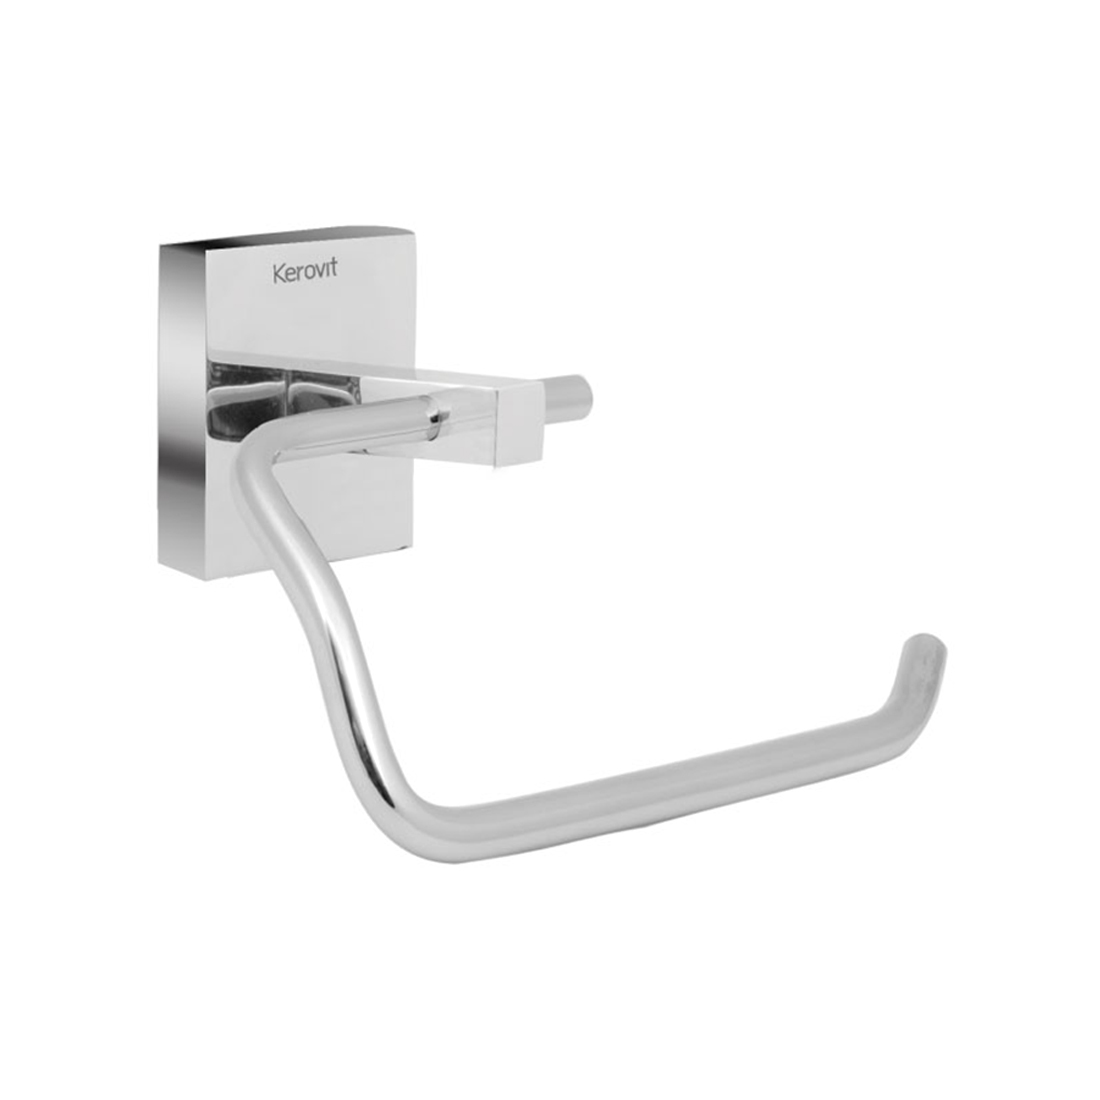 Kerovit KA990008 Square Range Toilet Paper Holder Without Flap